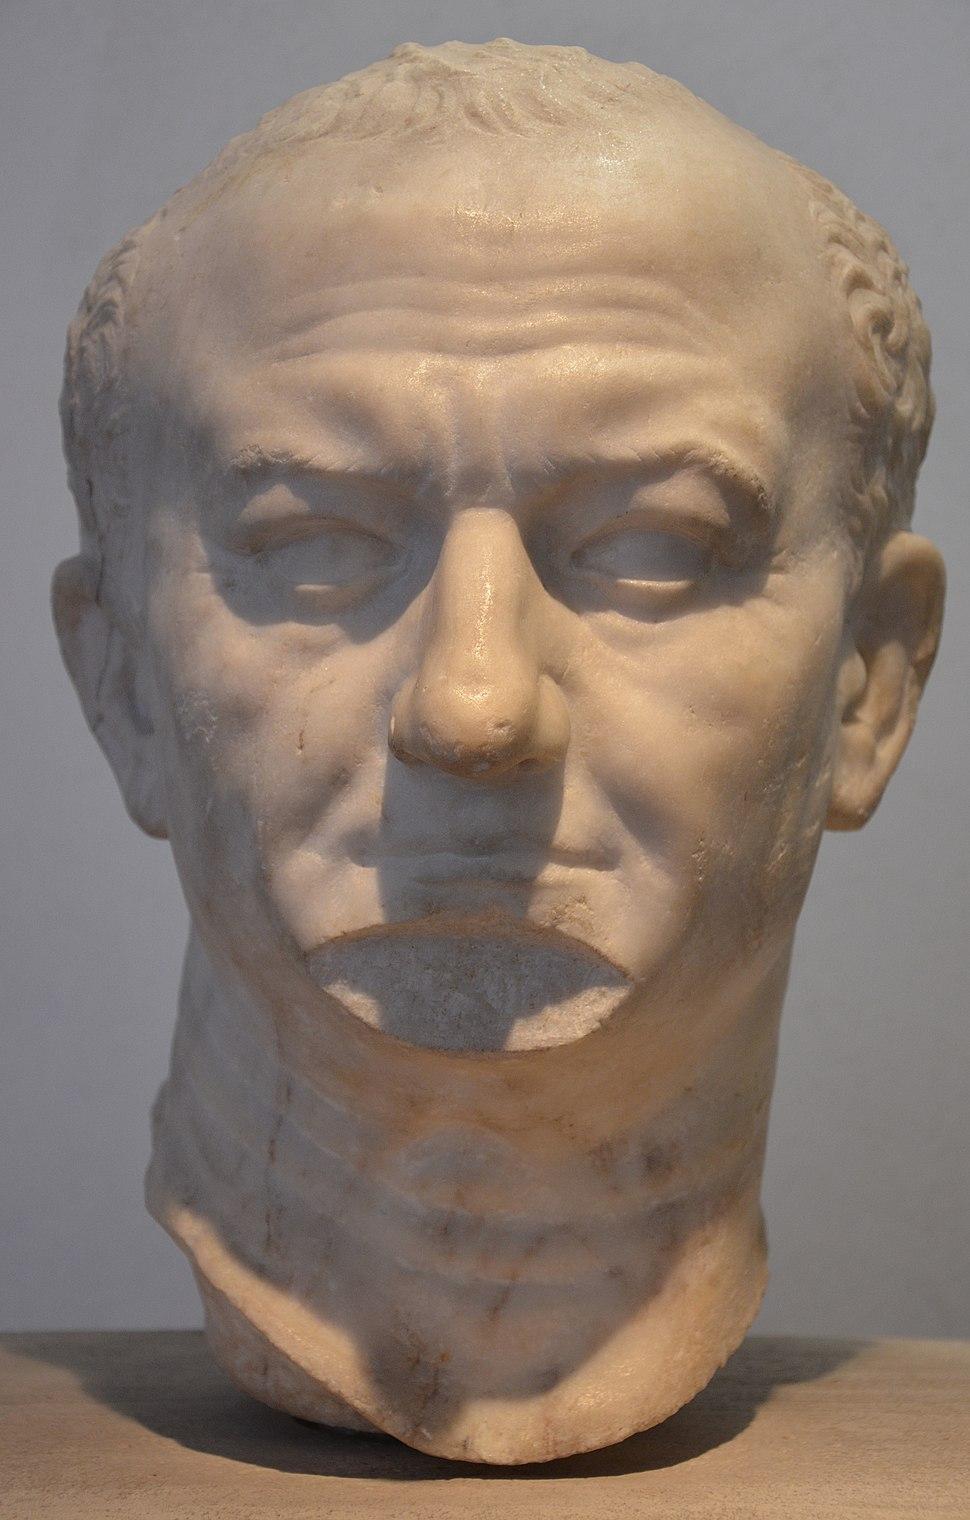 Vespasian, from Ostia, 69-79 CE, Palazzo Massimo alle Terme, Rome (13643233603)